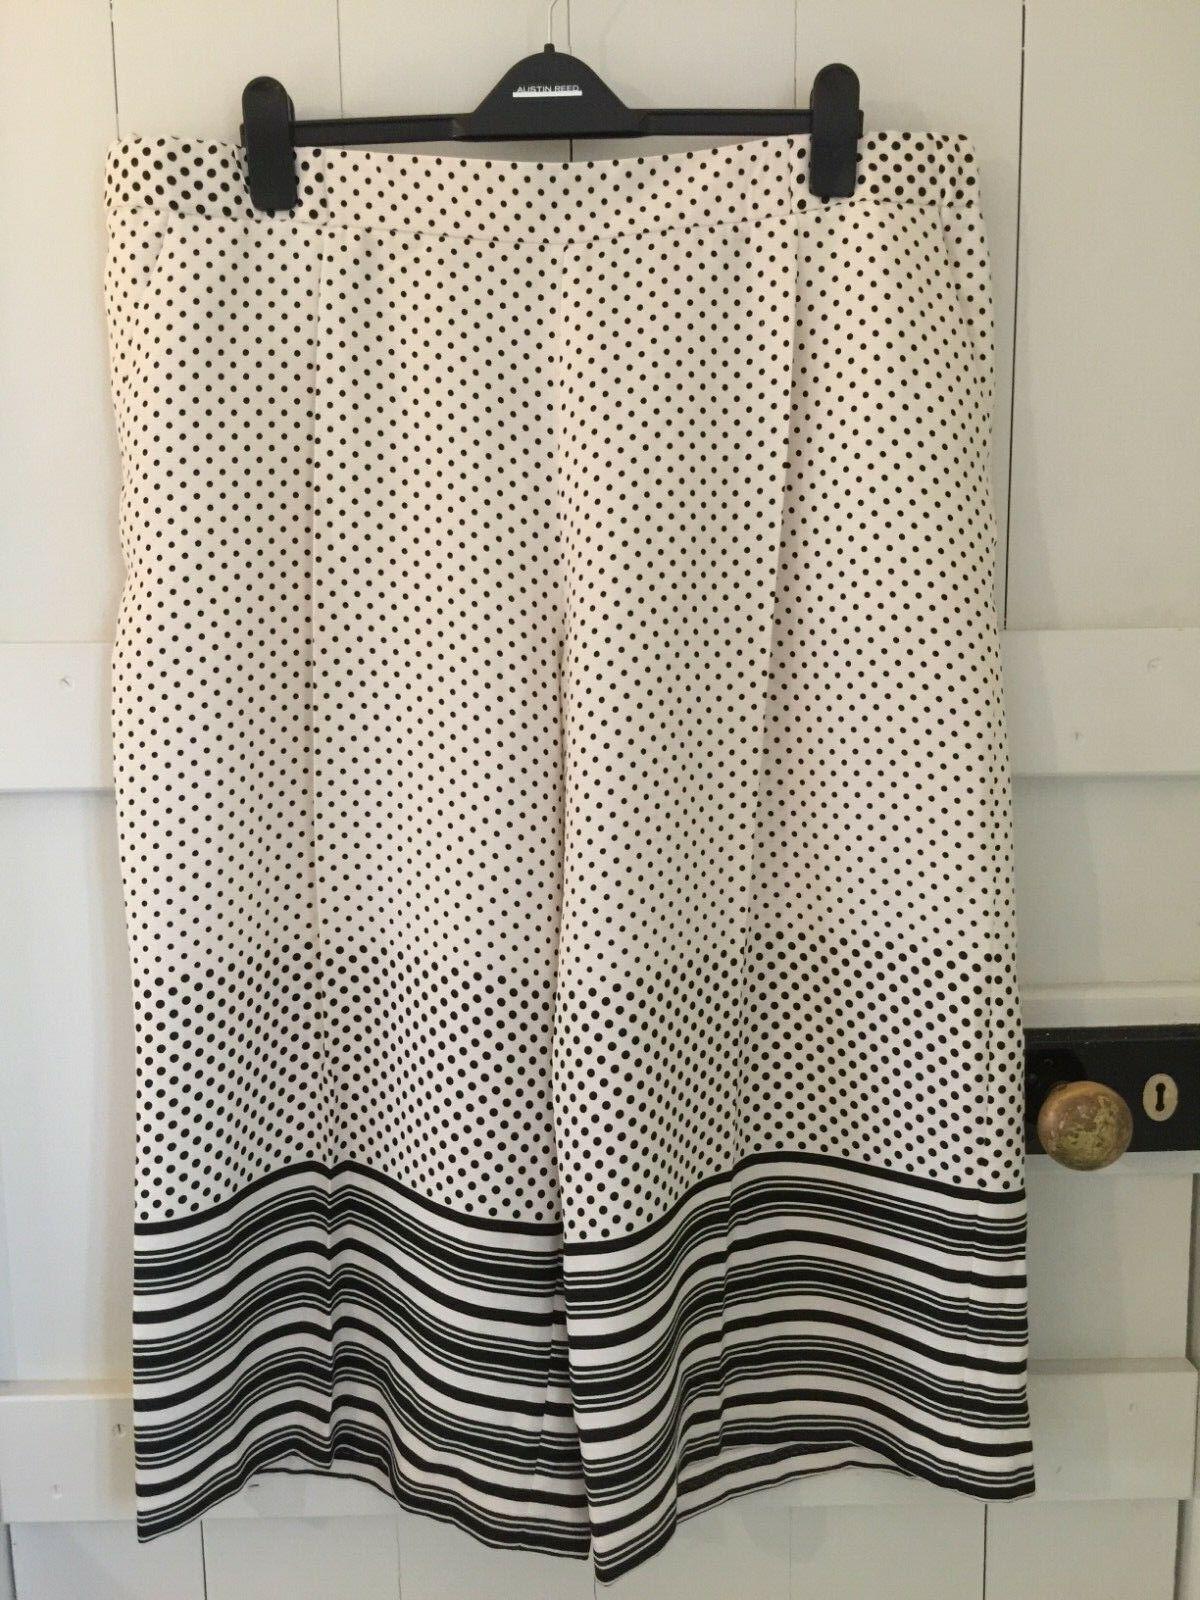 TOPSHOP maternity culotte trousers, UK size 18, BNWT, polkadot & stripes.